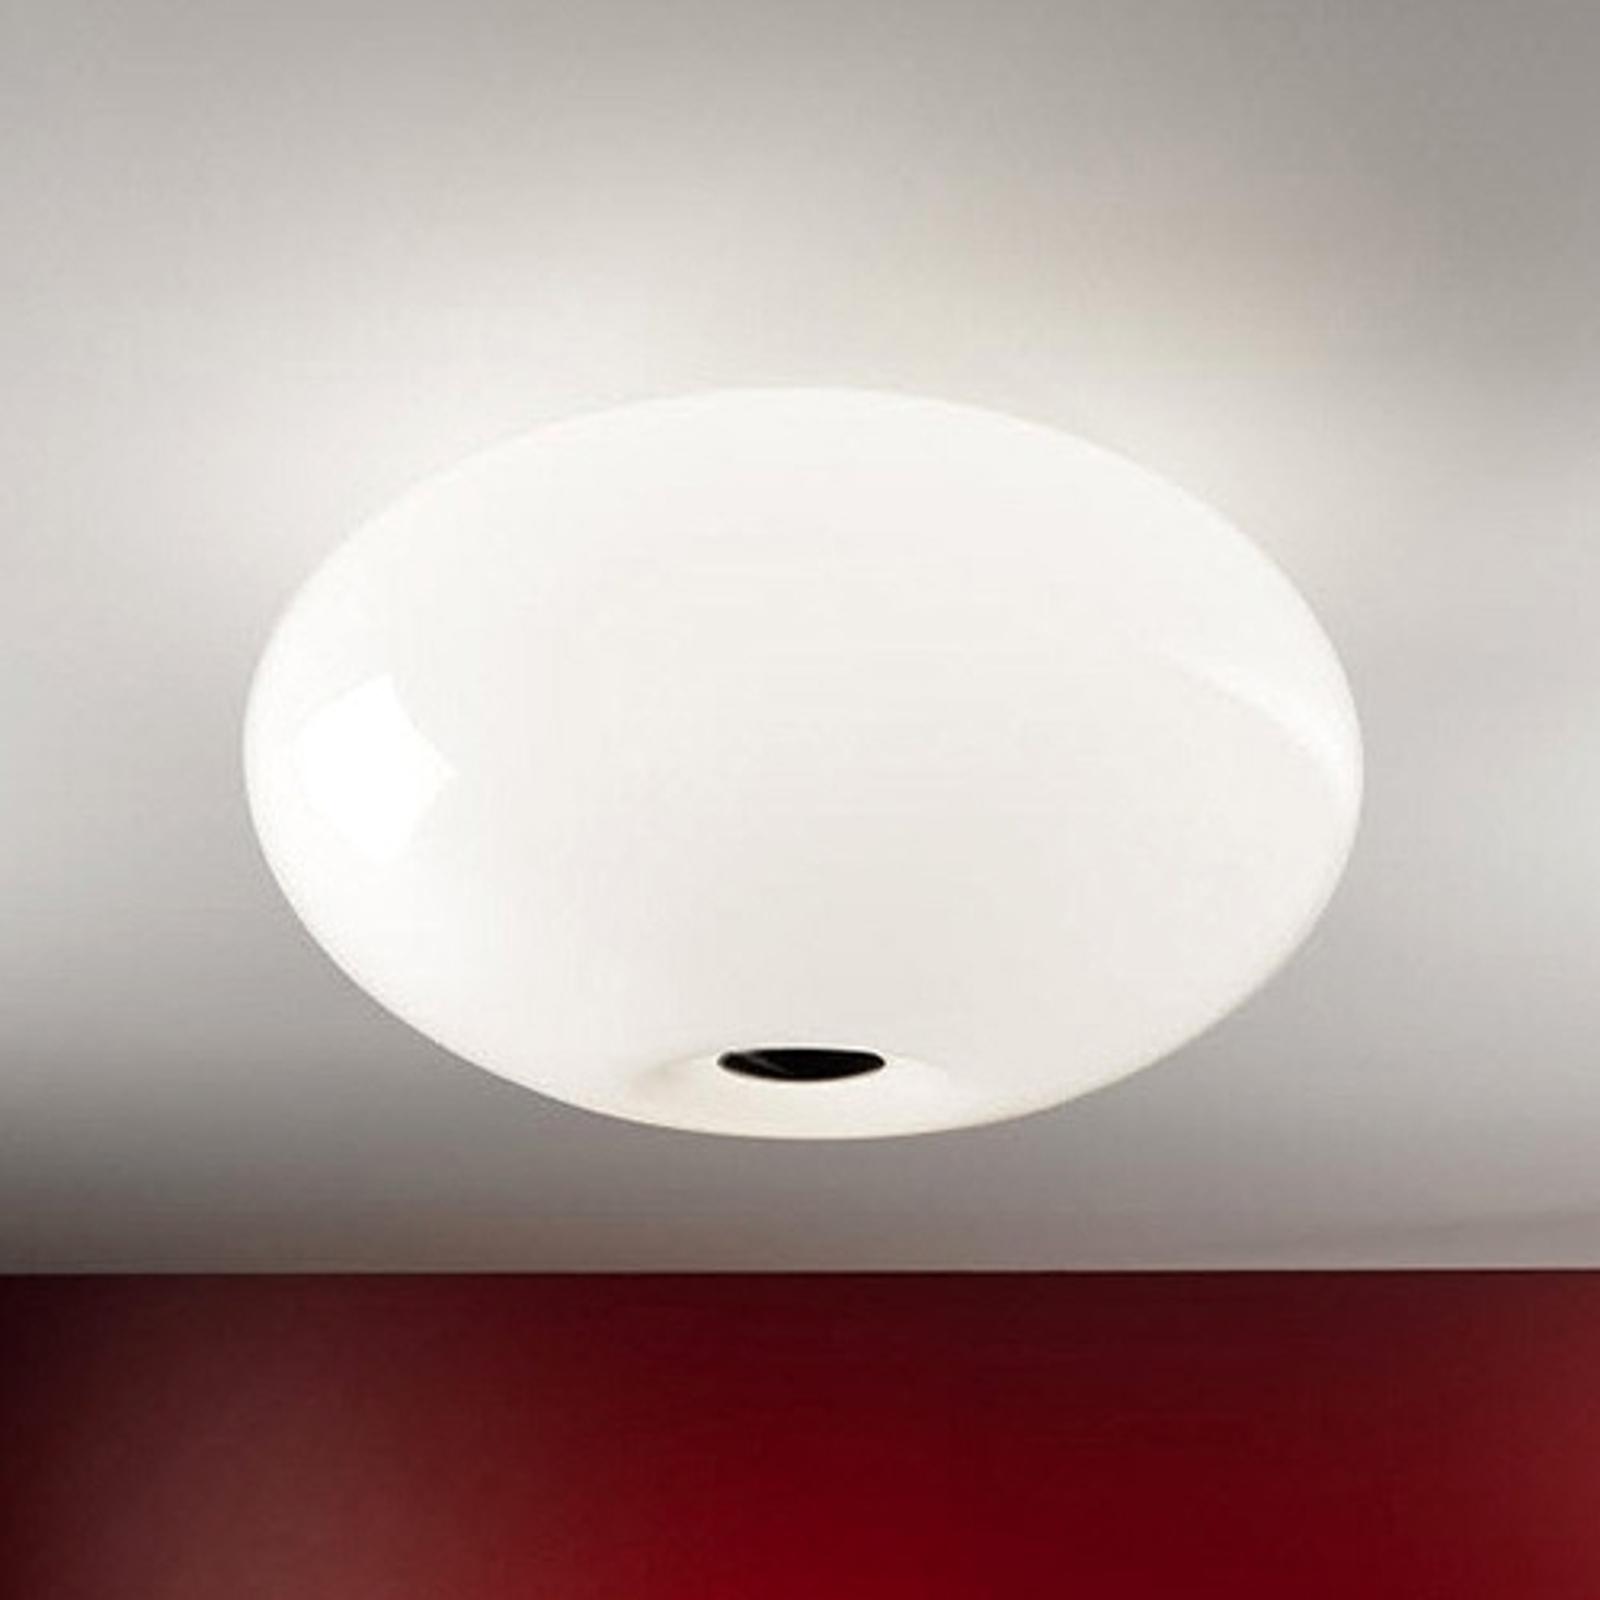 Superb ceiling light AIH 28 cm_2000204_1